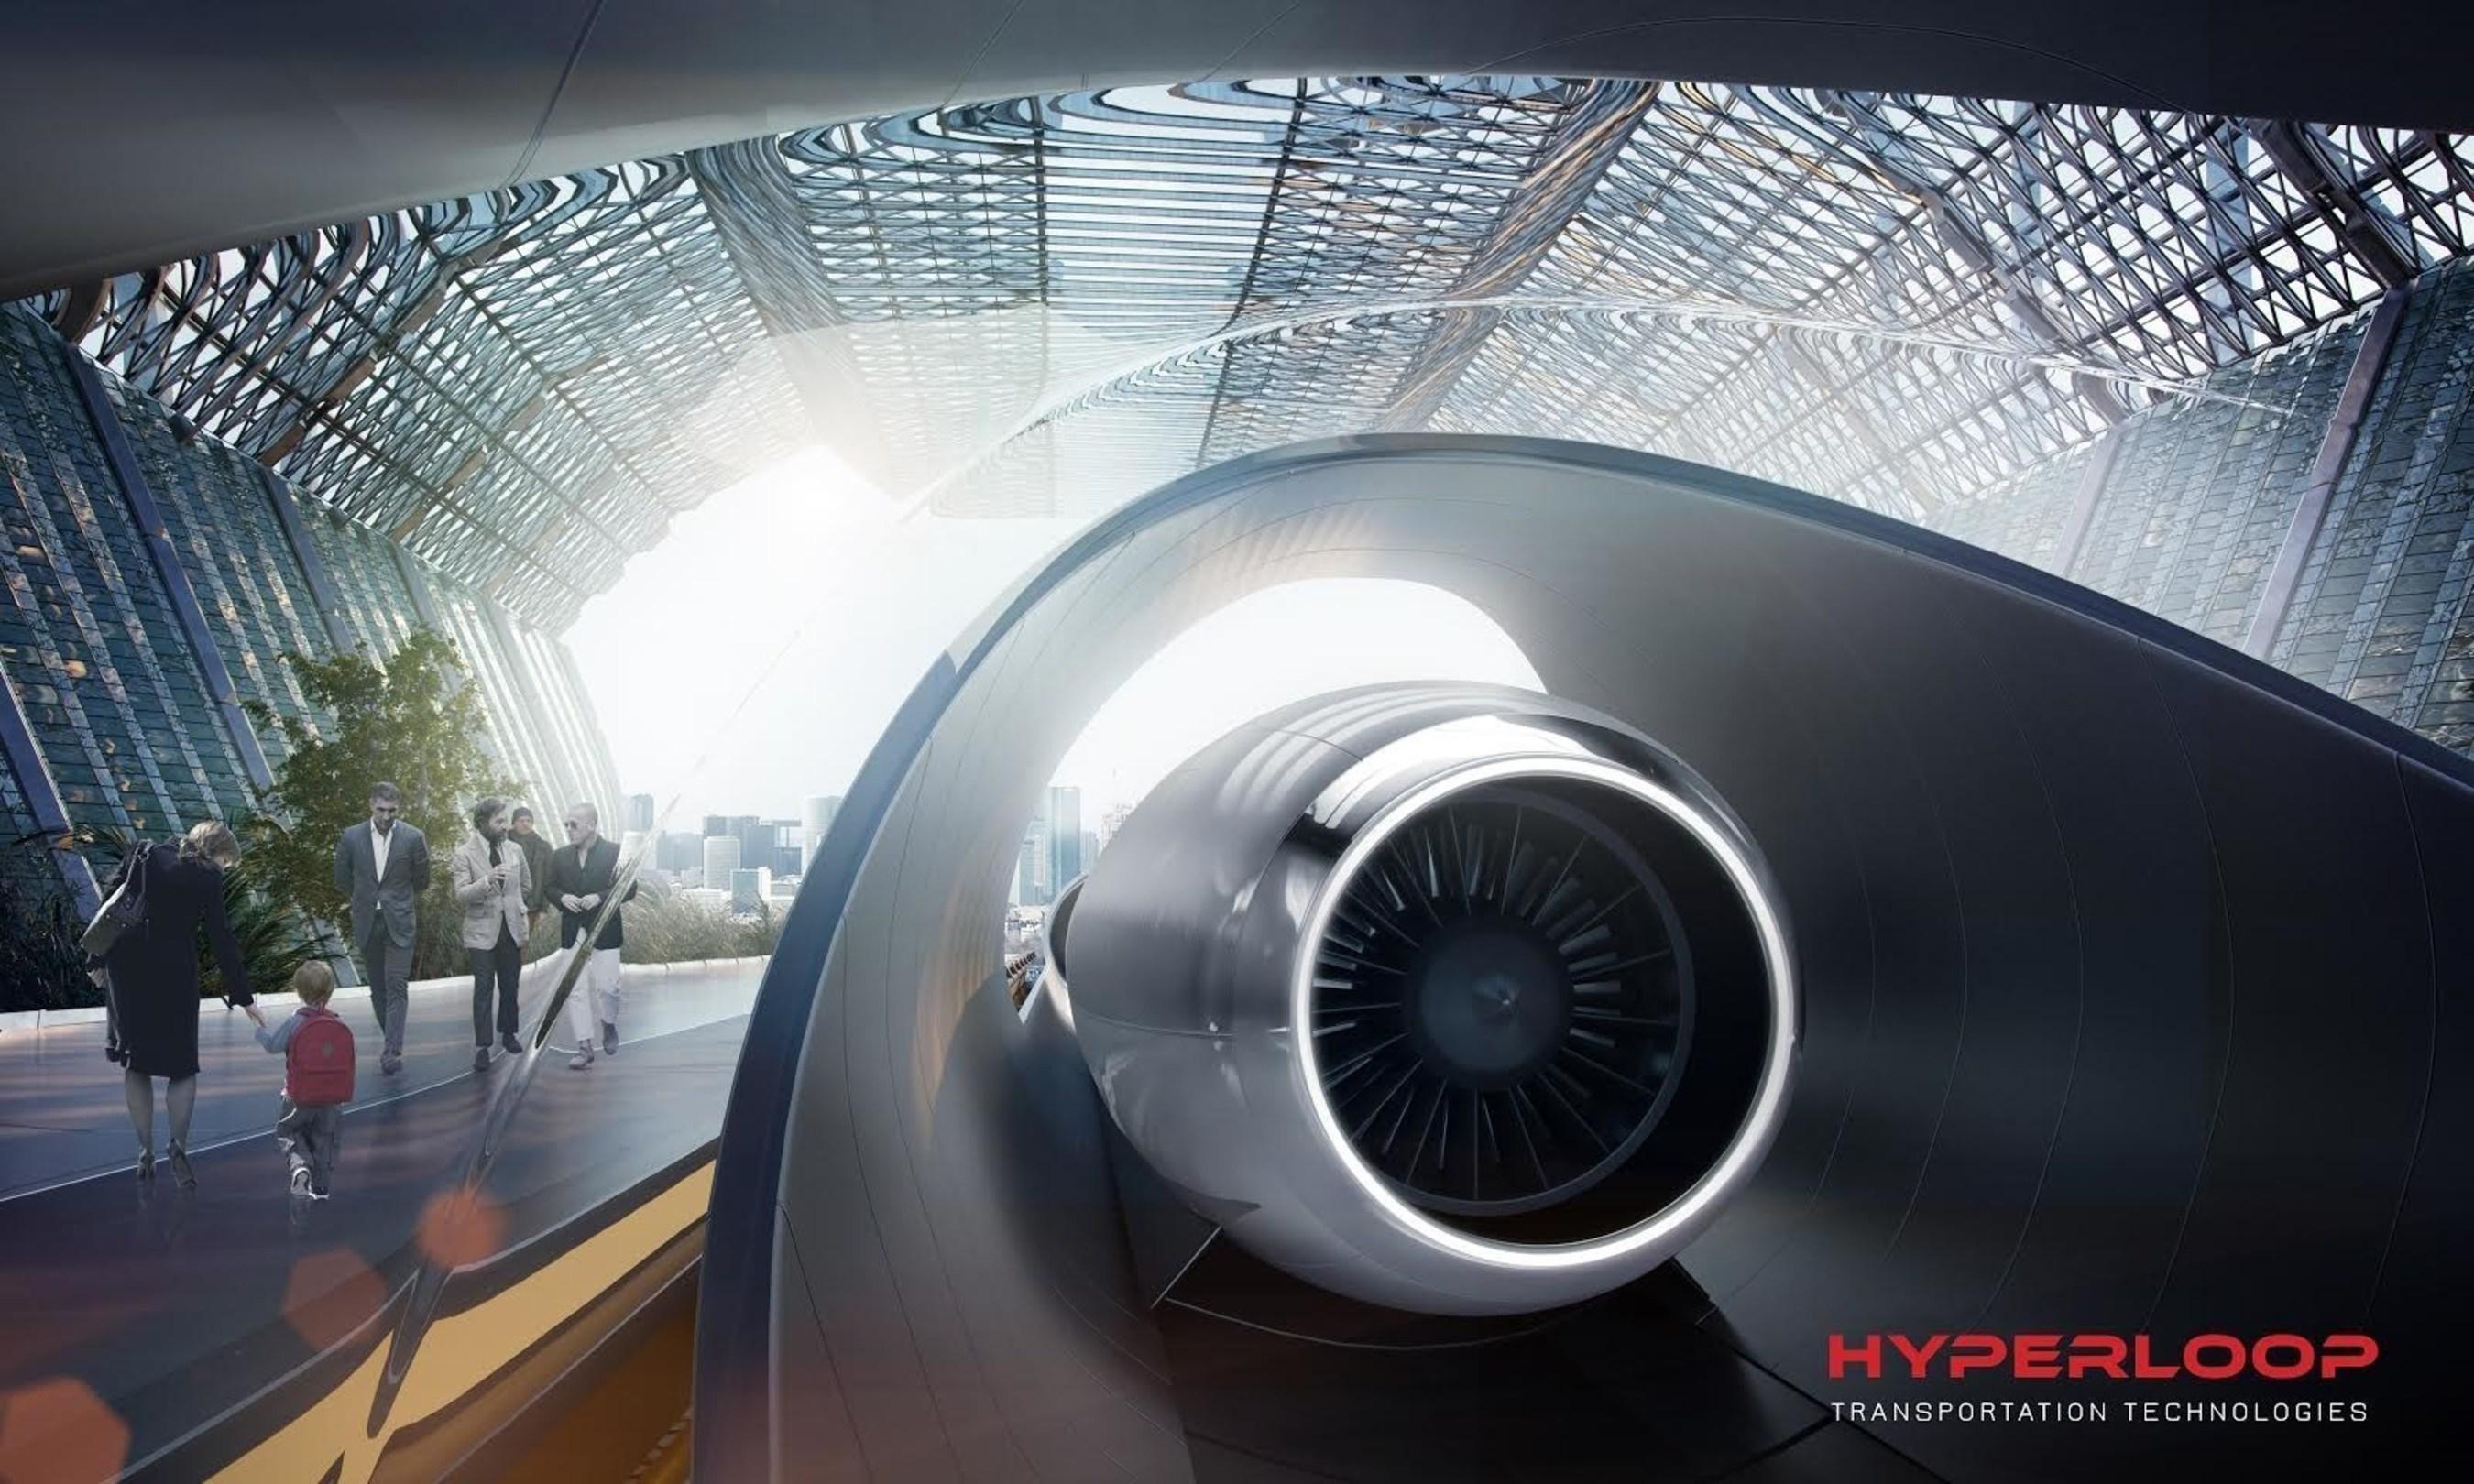 Hyperloop Transportation Technologies Surpasses $100 Million